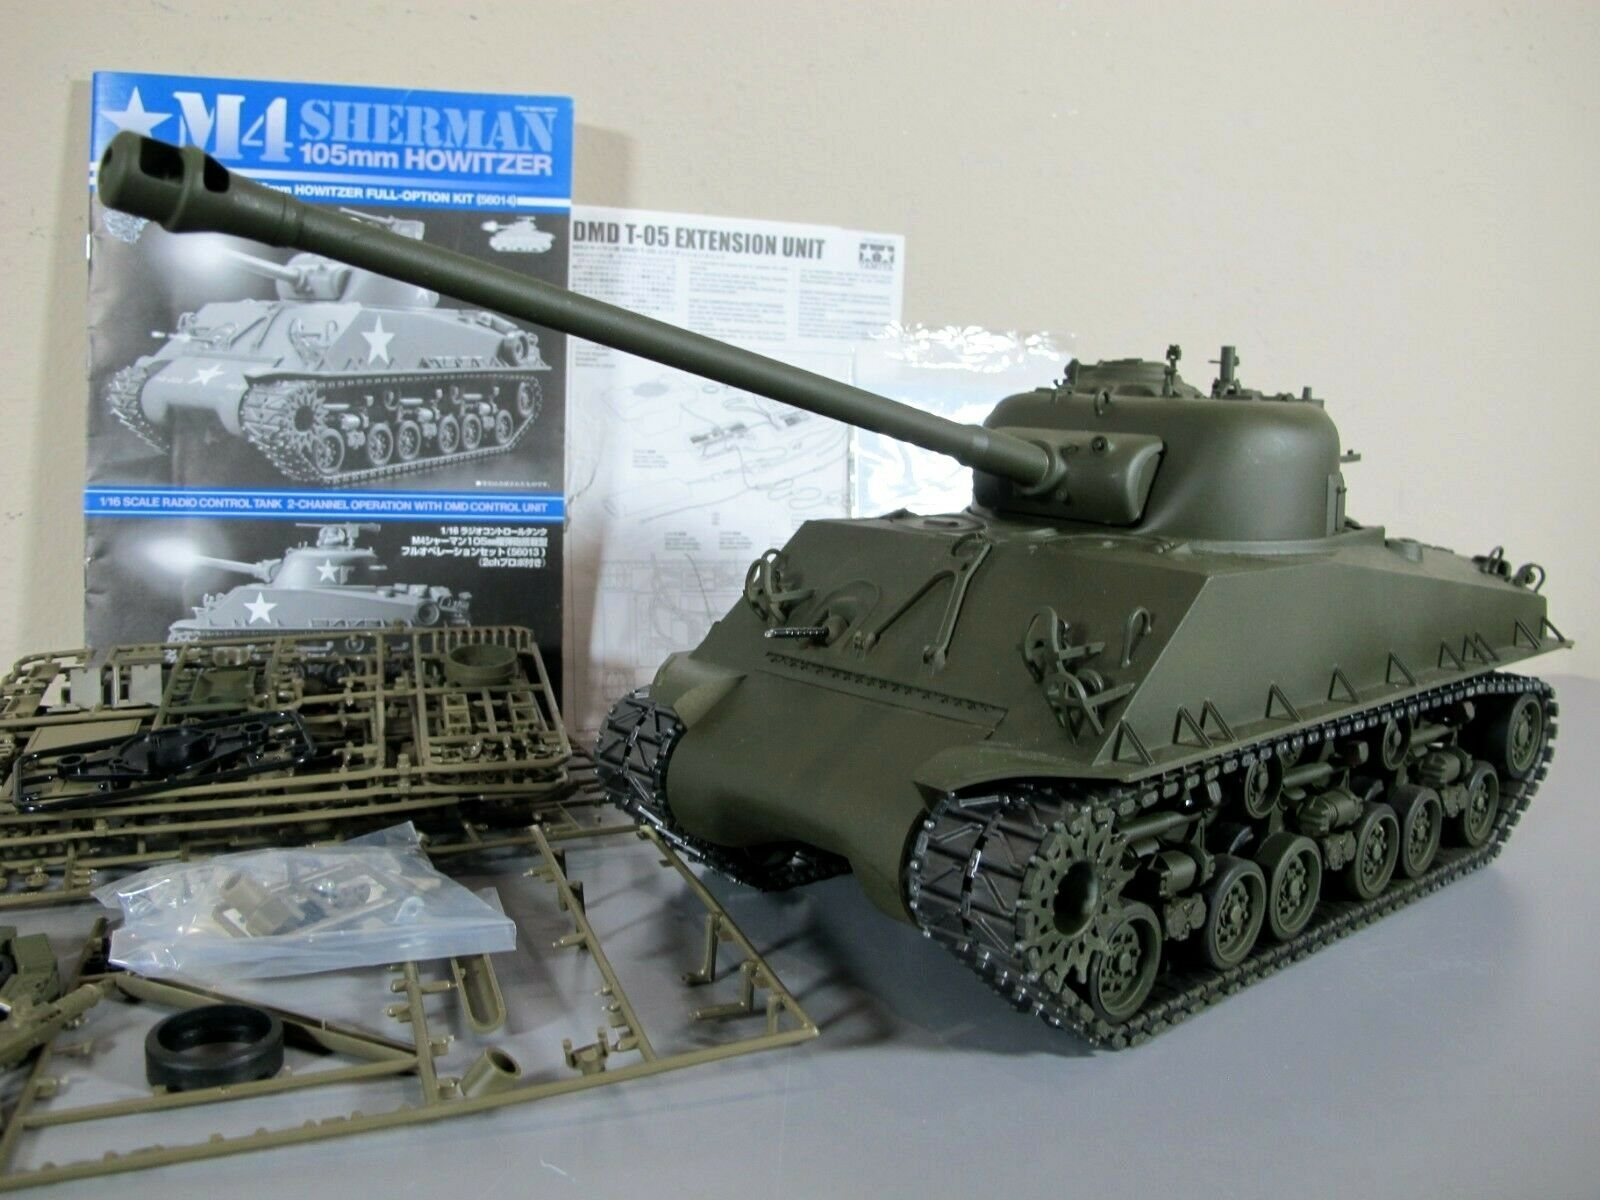 Tamiya 1  16 R C M4 Sheruomo 105mm Howitzer Full-Option Tank 56014 DMD Unit  più economico